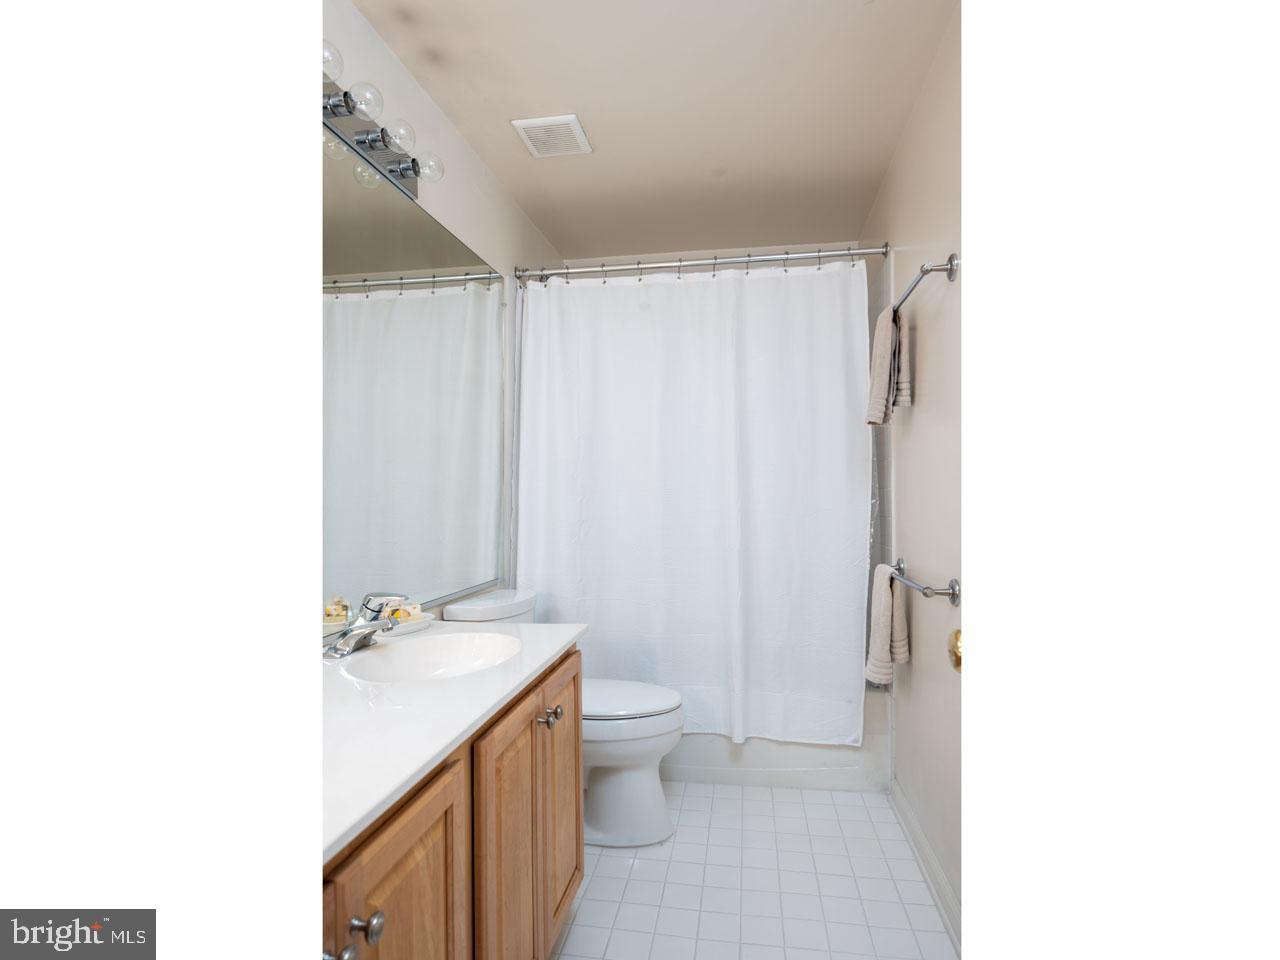 VAFX1104336-302201656511-2021-07-16-19-45-24  |   | Alexandria Delaware Real Estate For Sale | MLS# Vafx1104336  - Best of Northern Virginia